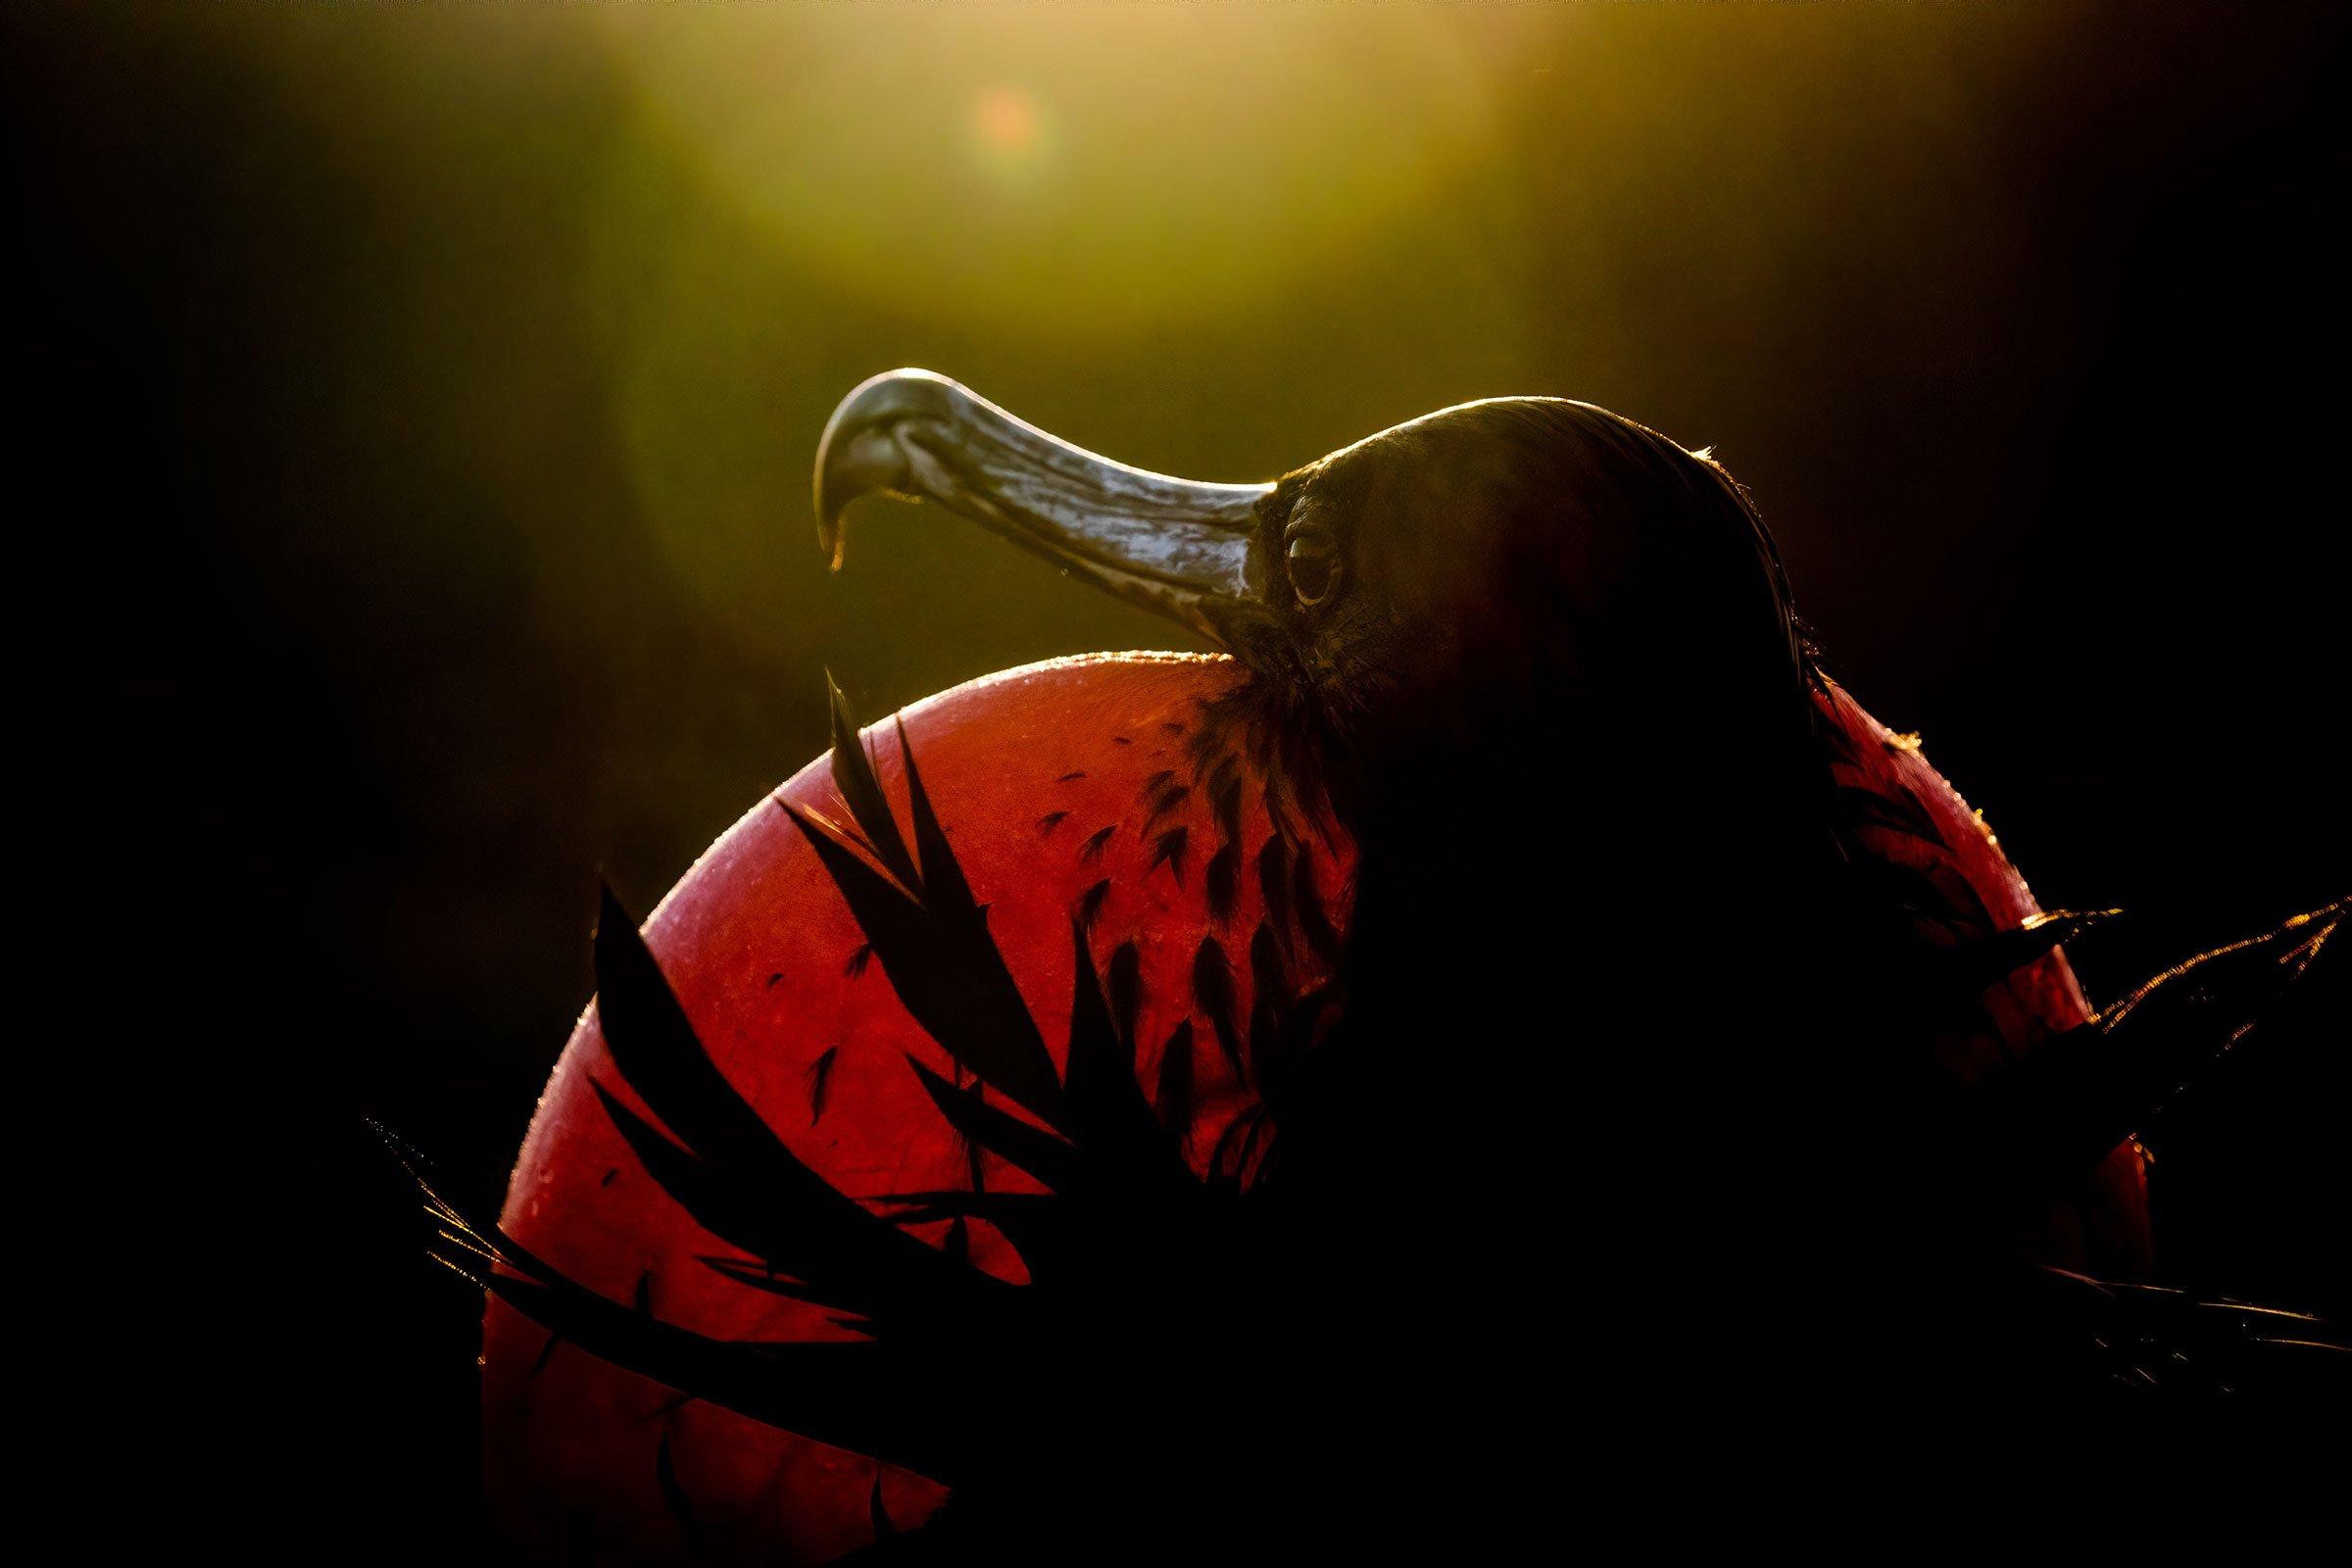 web_007_Pro_01_Magnificent-Frigatebird-_Sue-Dougherty_professional_highres